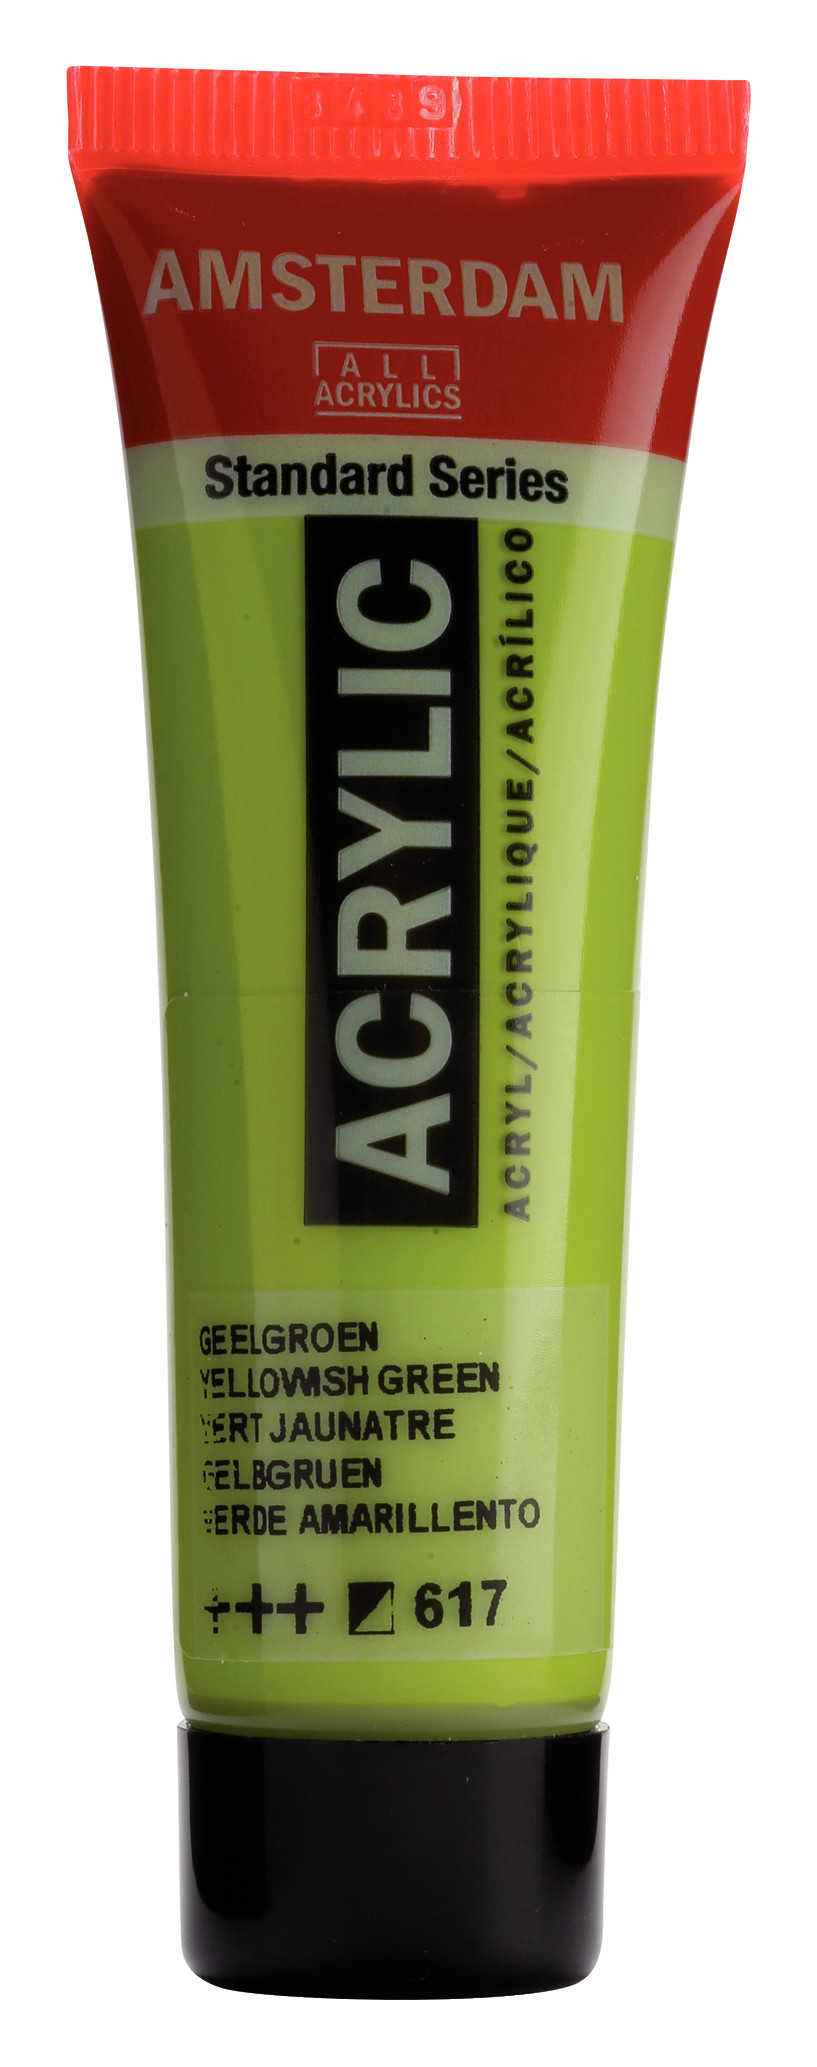 Amsterdam Standard Series Acrylic Tube 20 ml Yellowish green 617